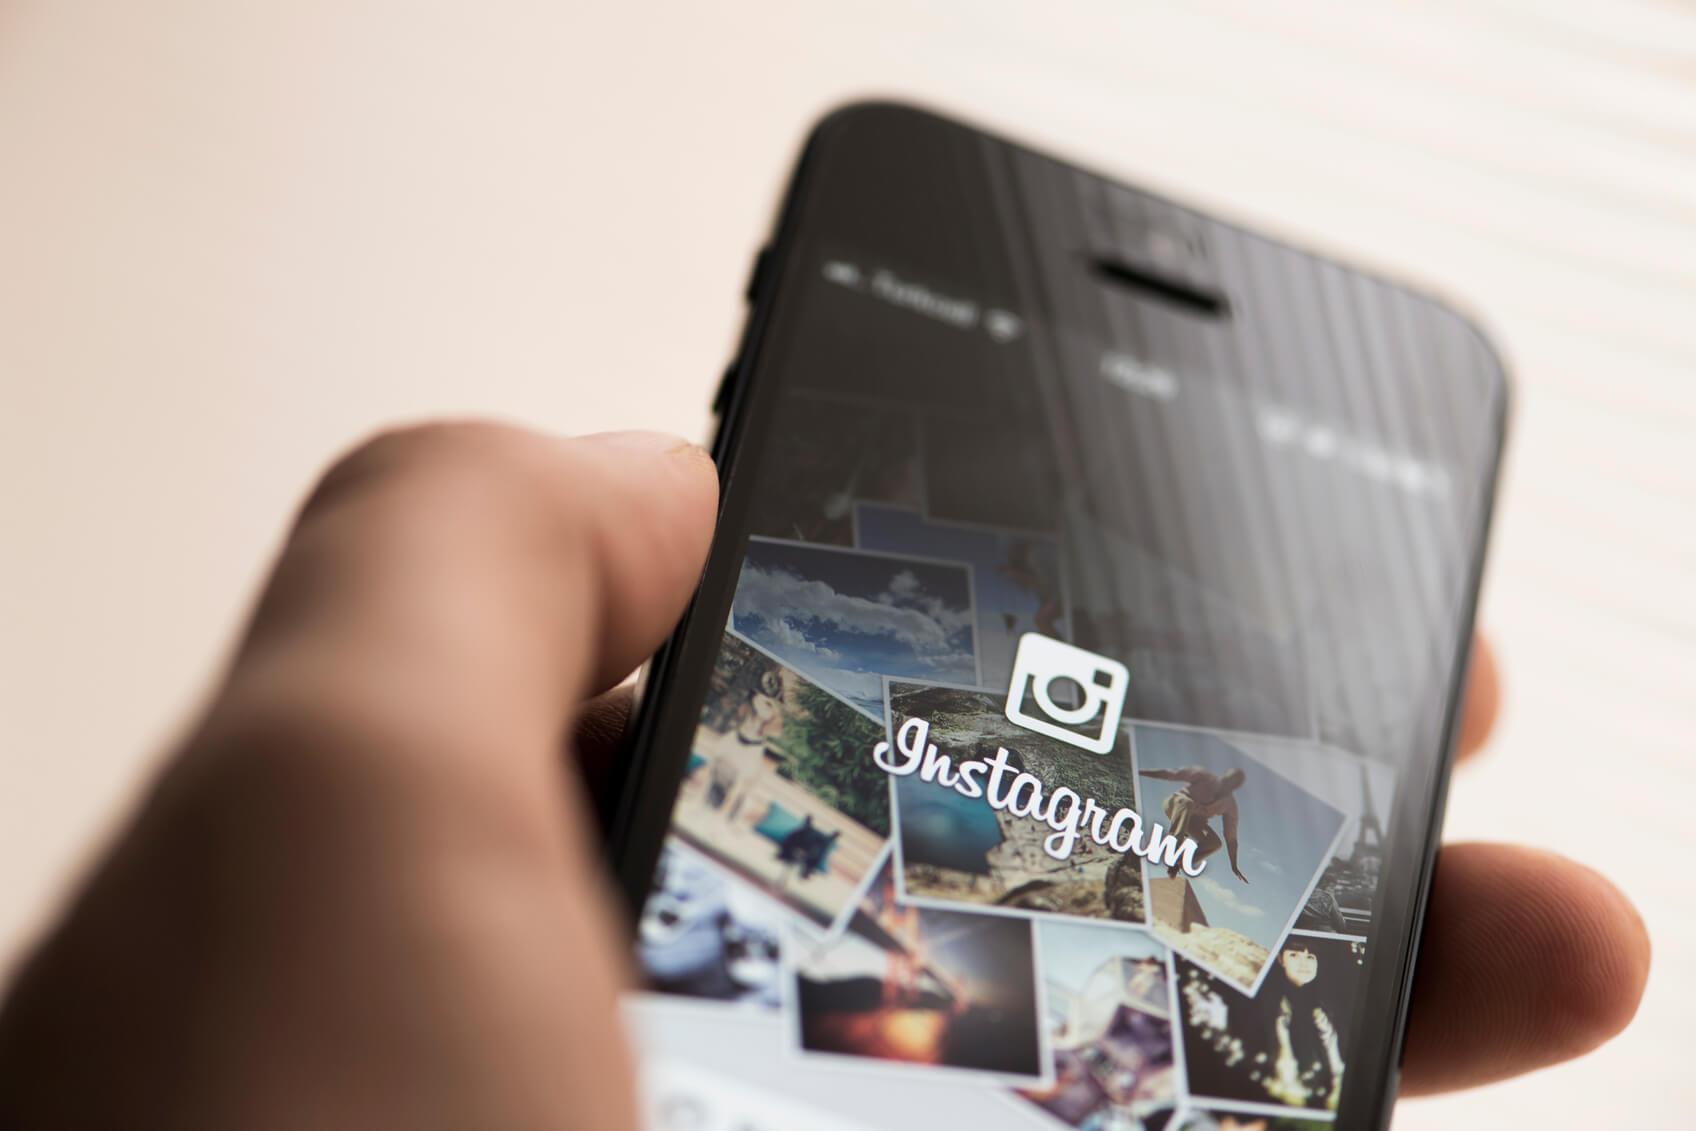 Instagrams_New_Filter_Tool.jpg